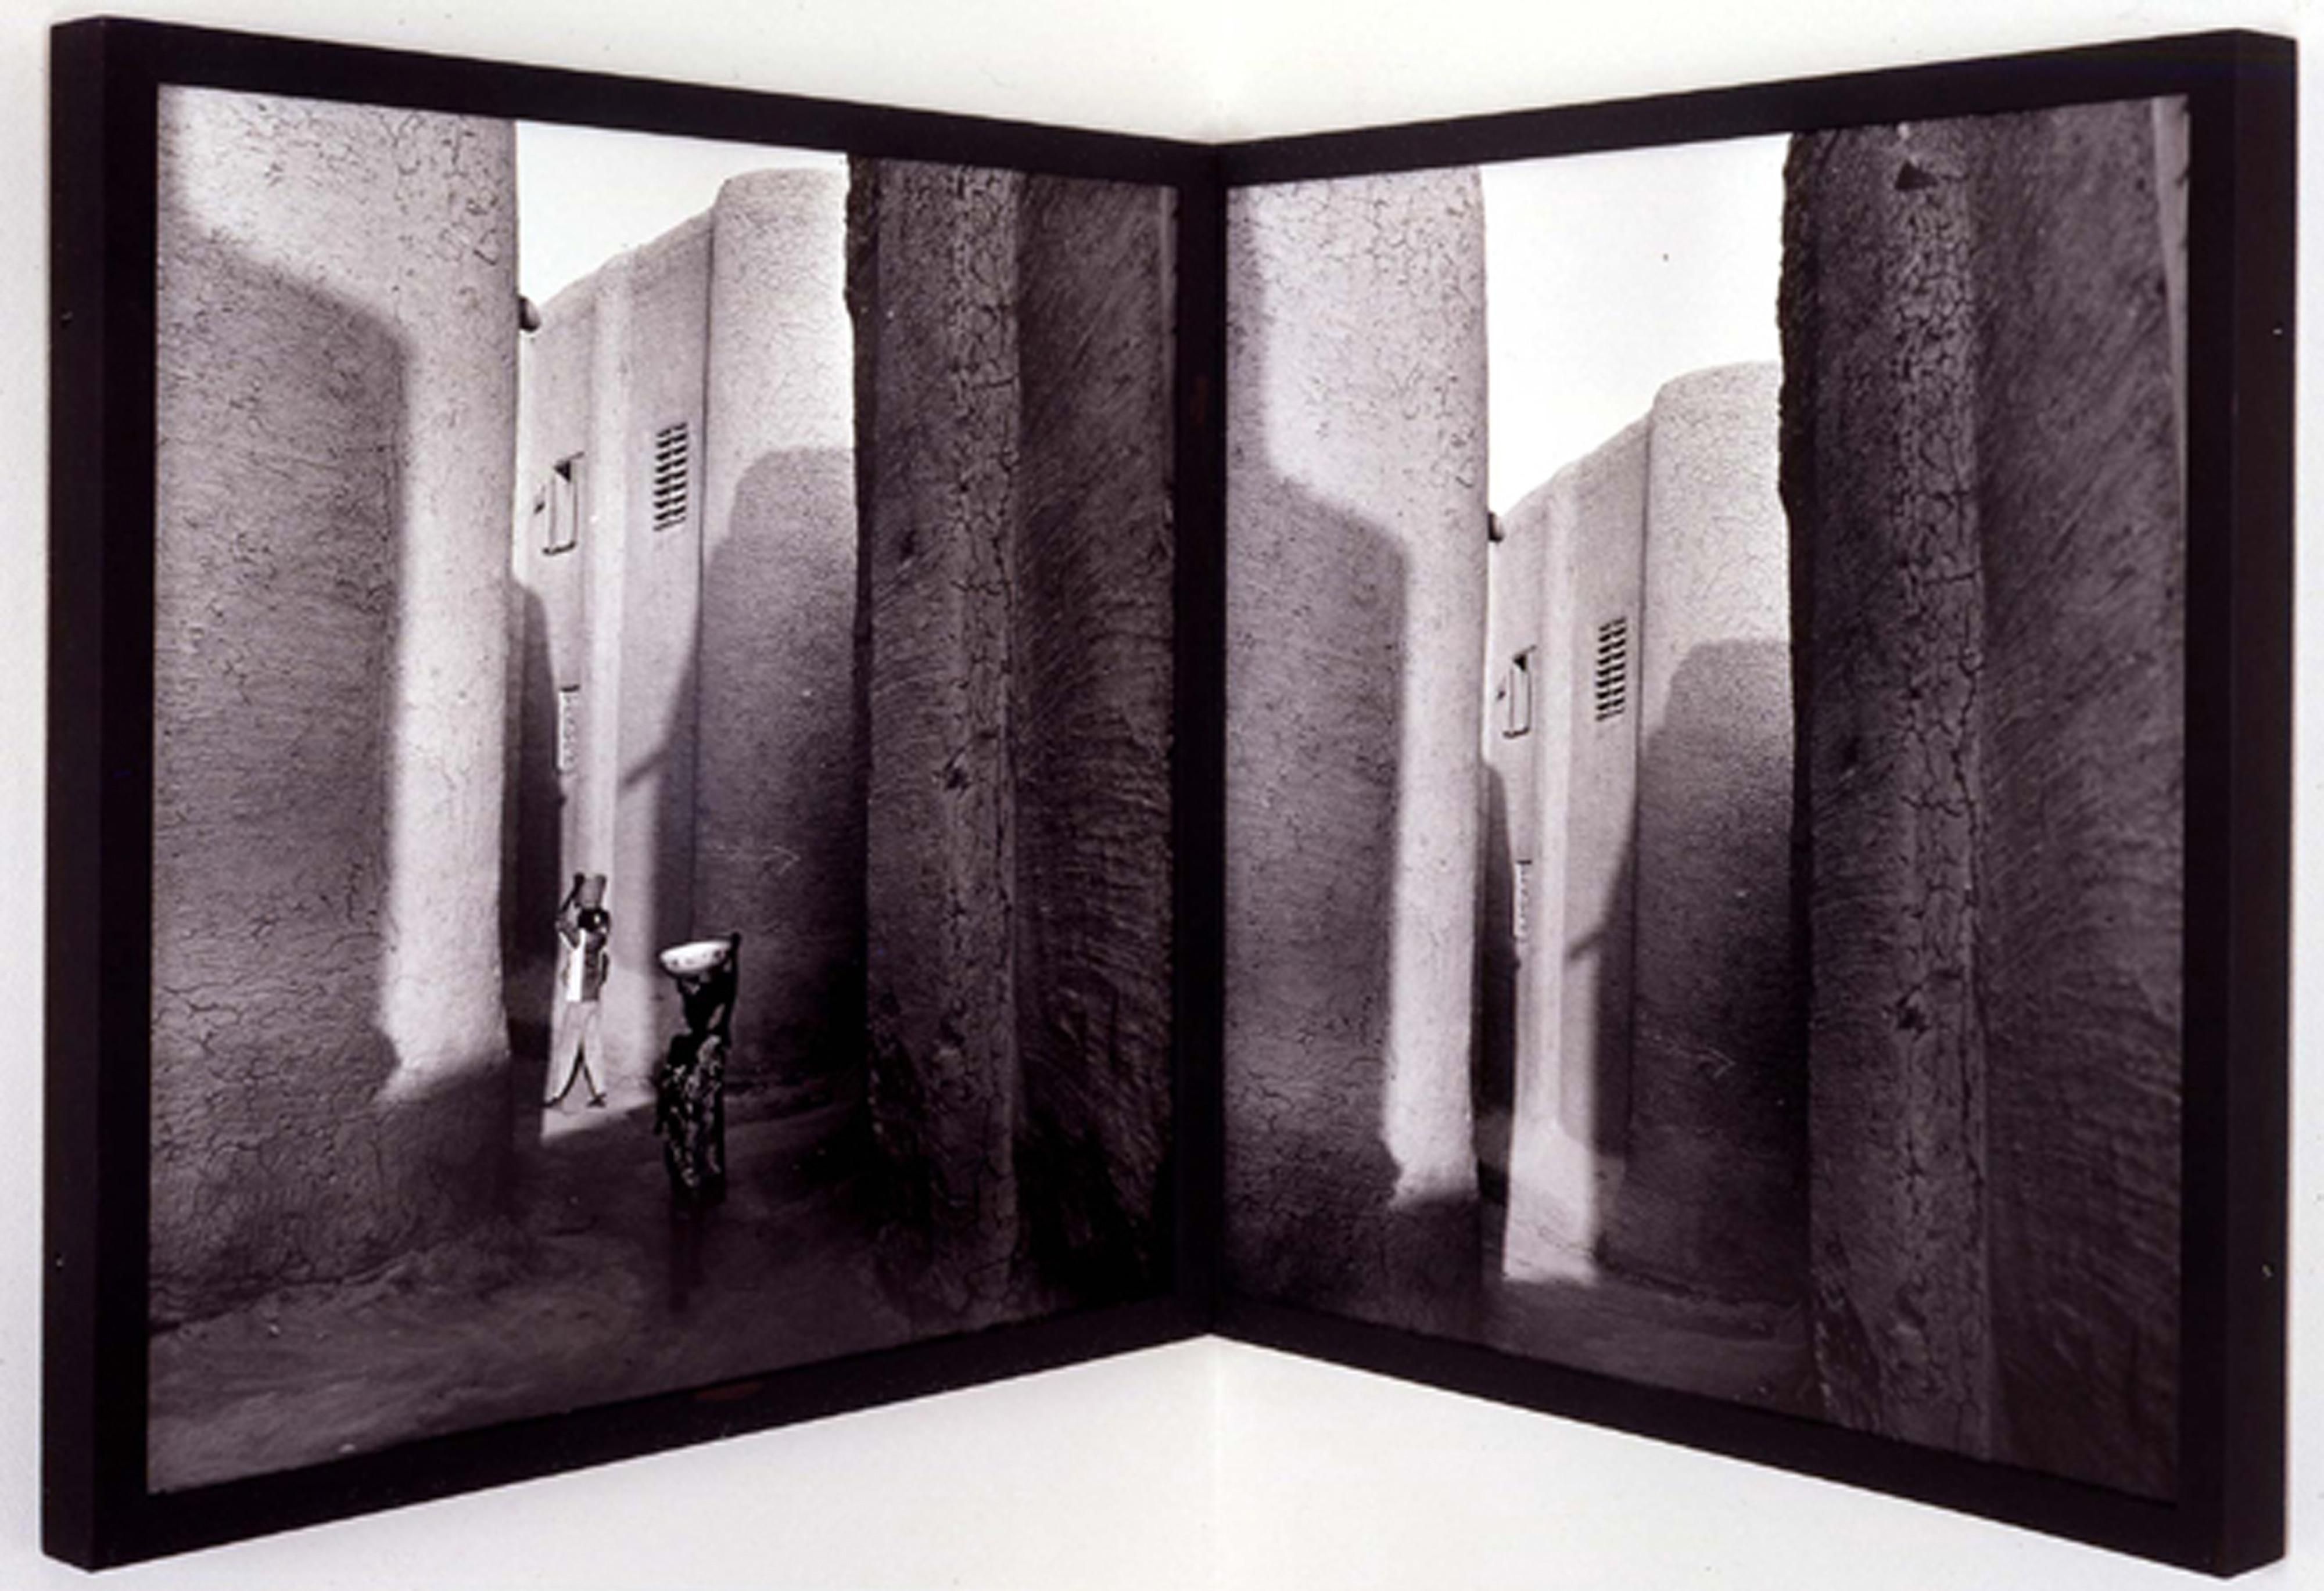 Galerie Barbara Thumm \ Carrie Mae Weems: Passage Way (diptych) (CMW-93-003) \ Passage Way (diptych) (1993)